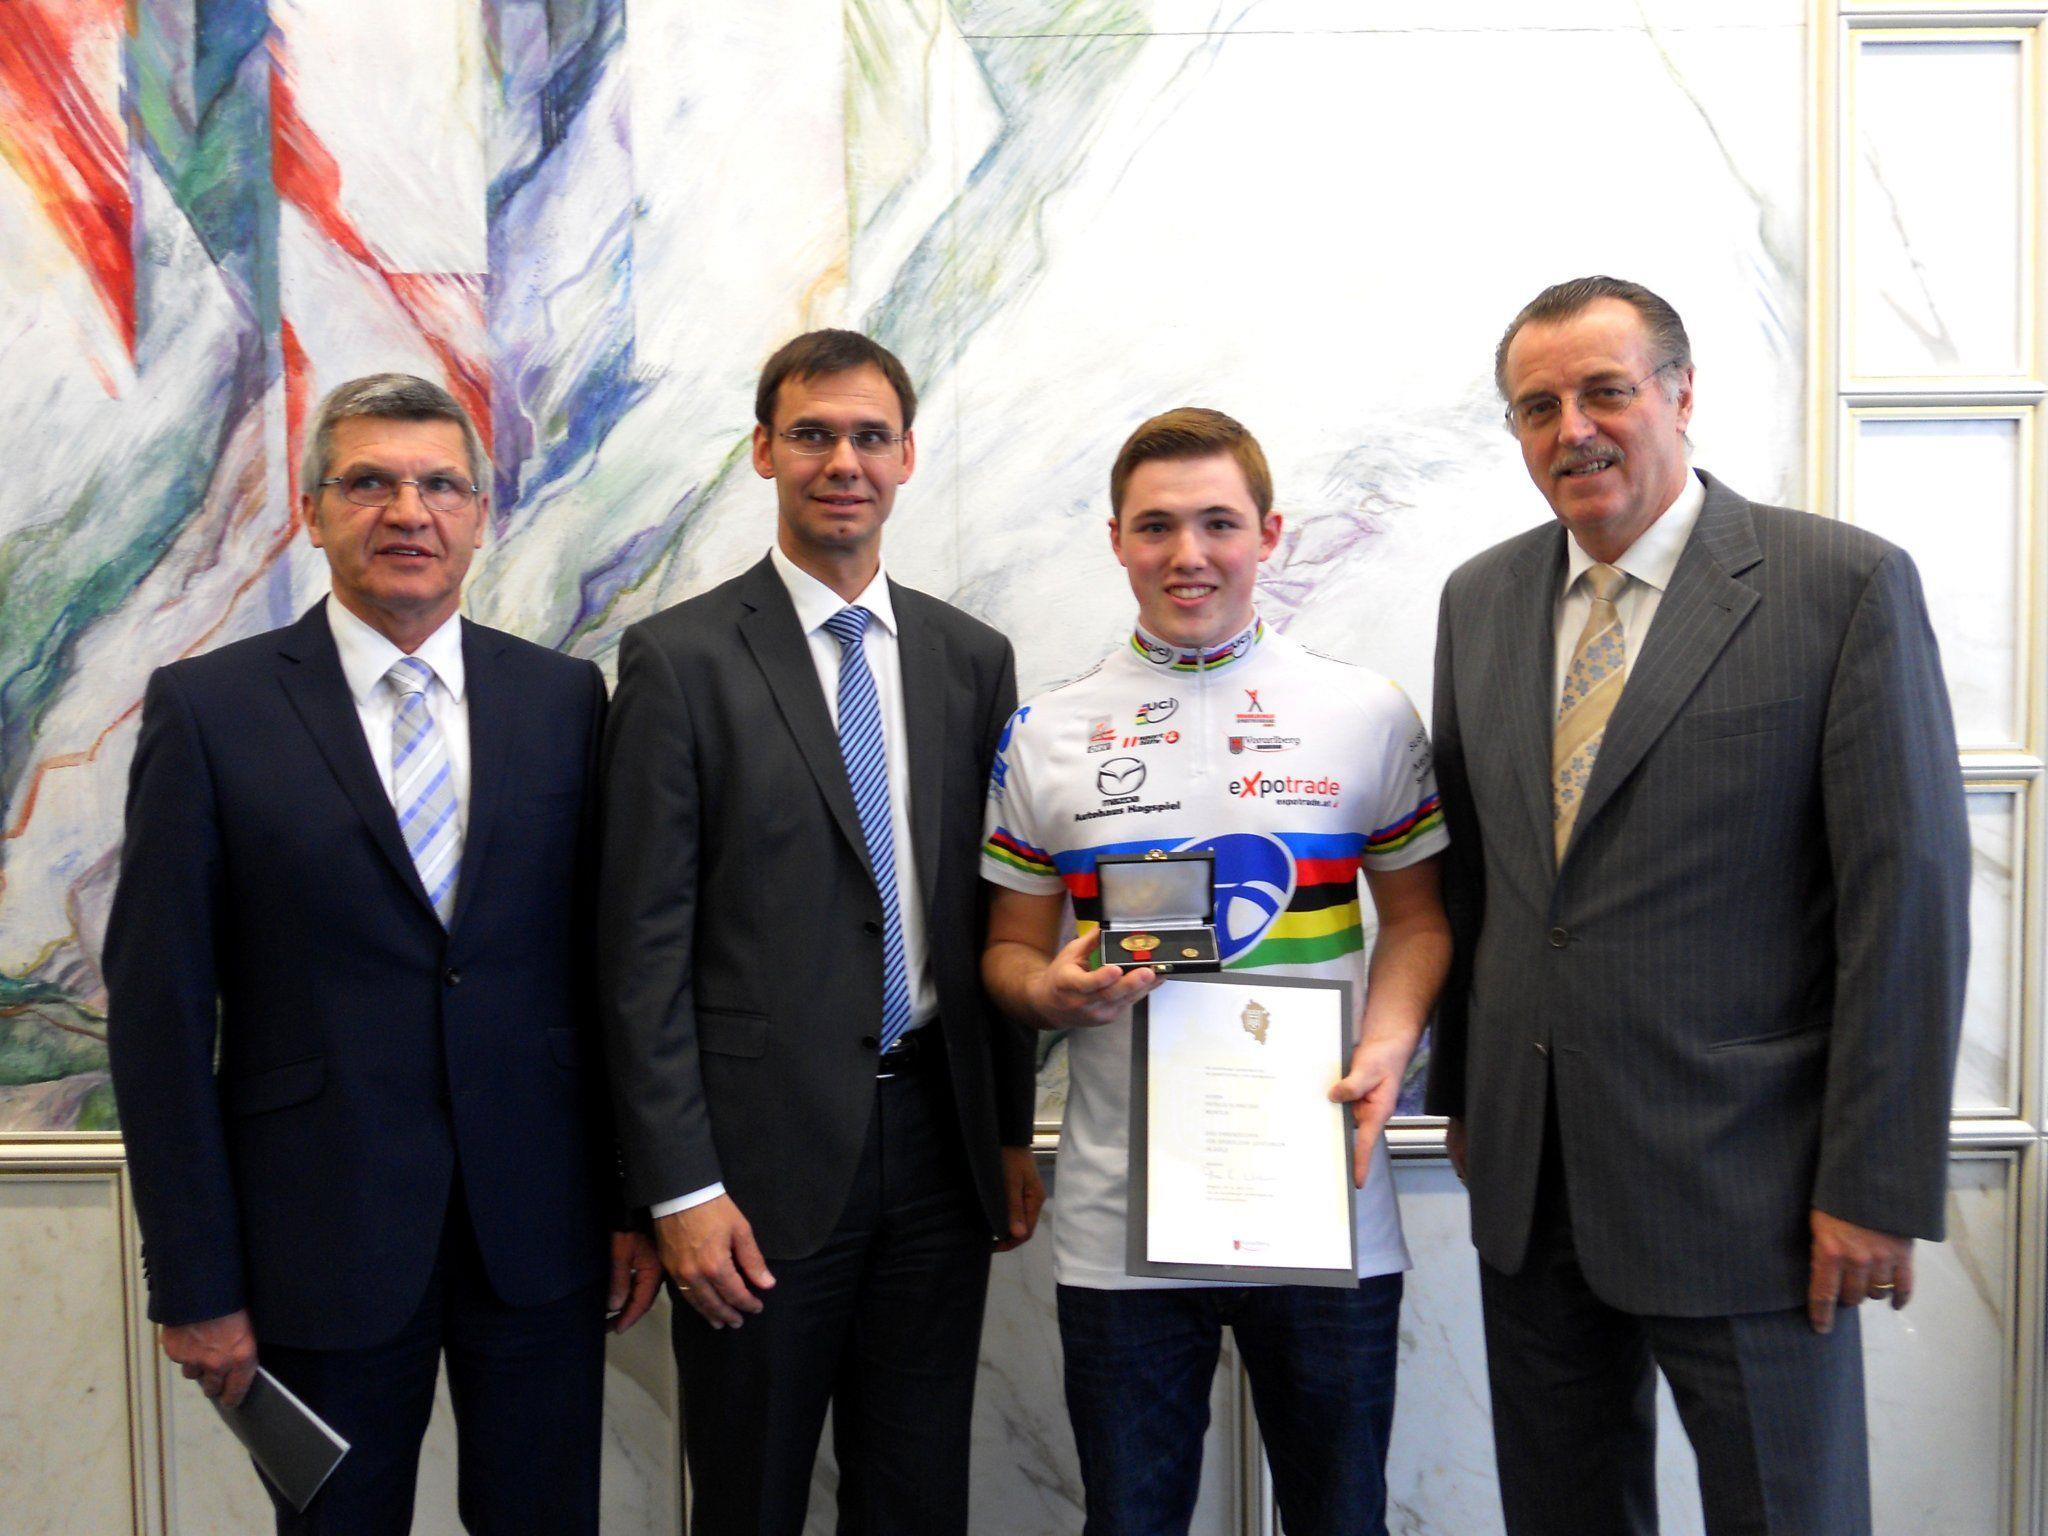 Sport Landesrat Sigi Stemer, Landeshauptmann Markus Wallner gratulieren dem jungen Weltmeister.